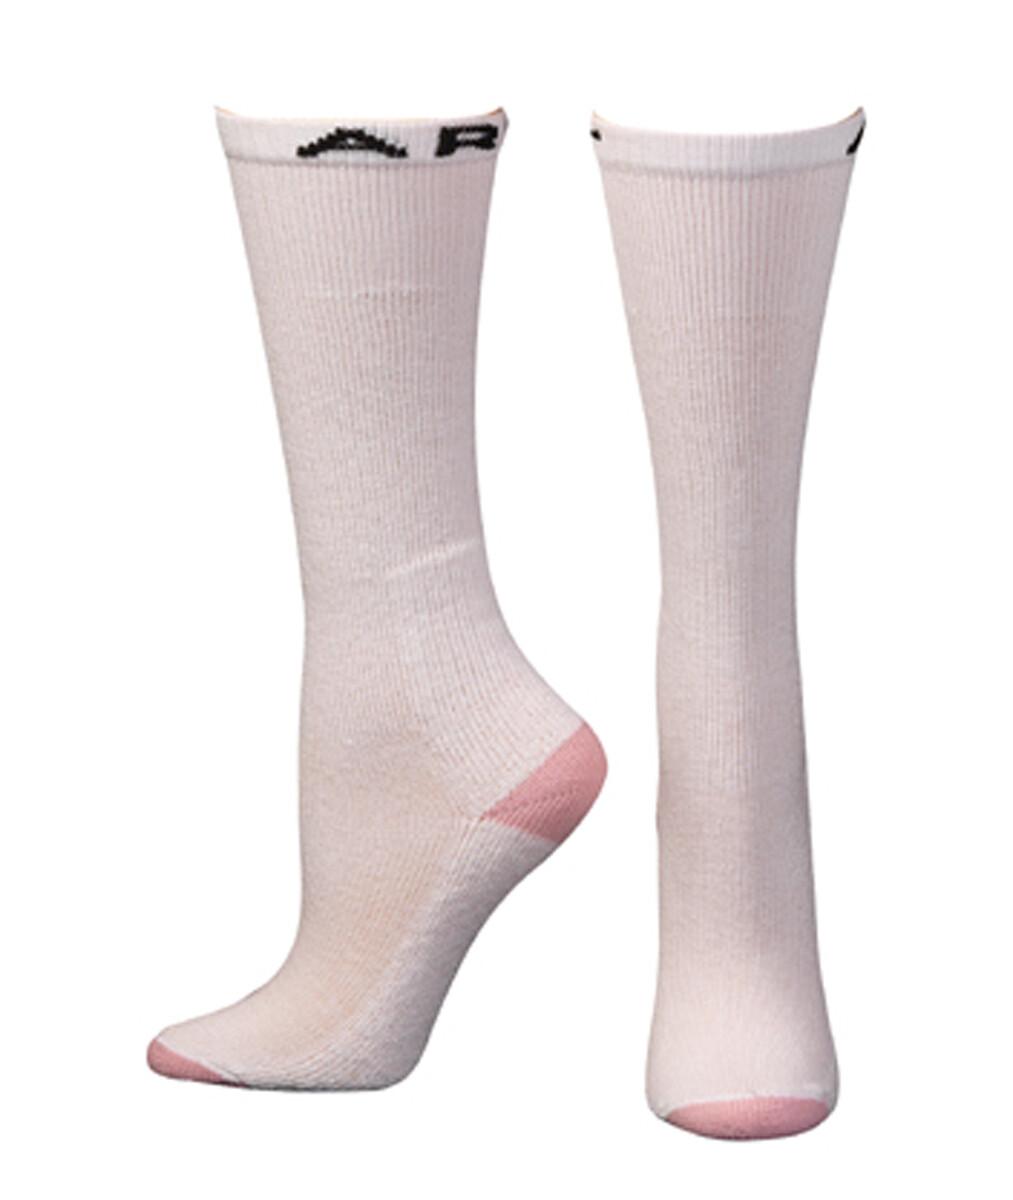 A2500405 Ariat Over the Calf Boot Socks WM